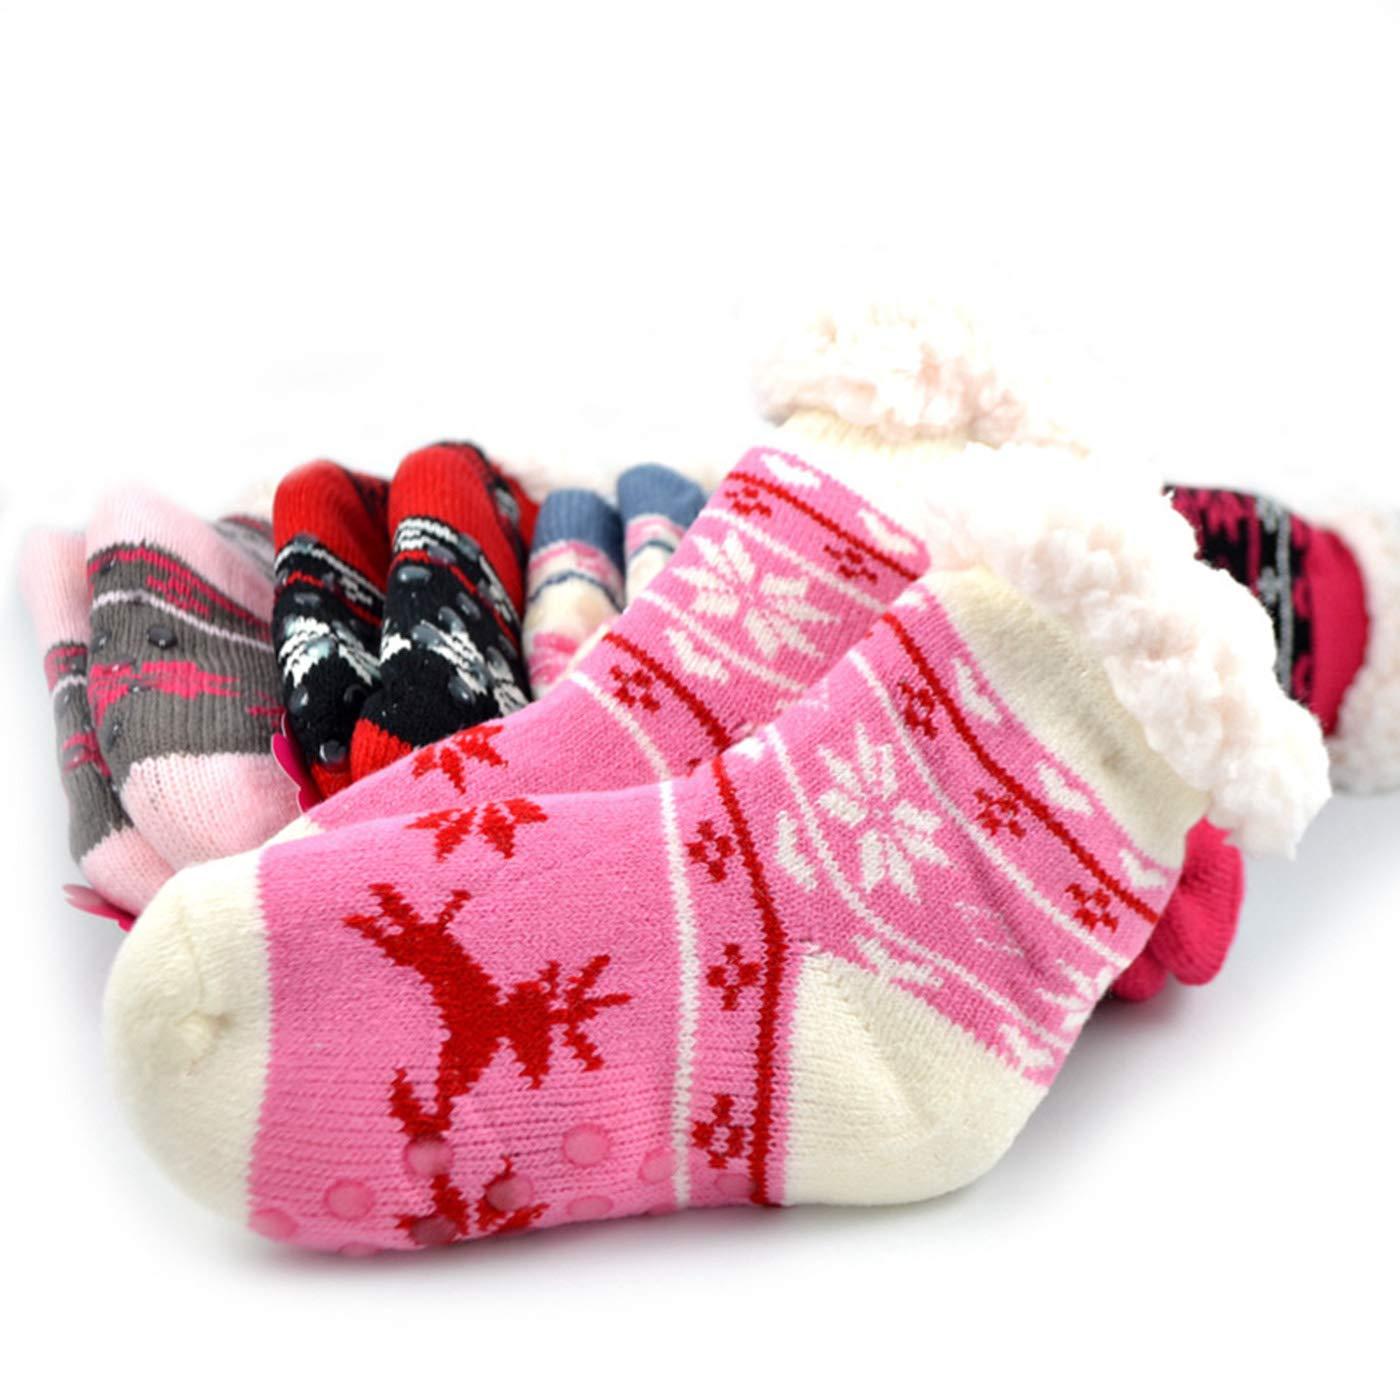 Newborn Infant Toddler Slipper Socks,Cute Cartoon Socks Sherpa-lined Kids Grips Socks Fuzzy Warm Socks for Baby Girls Boys